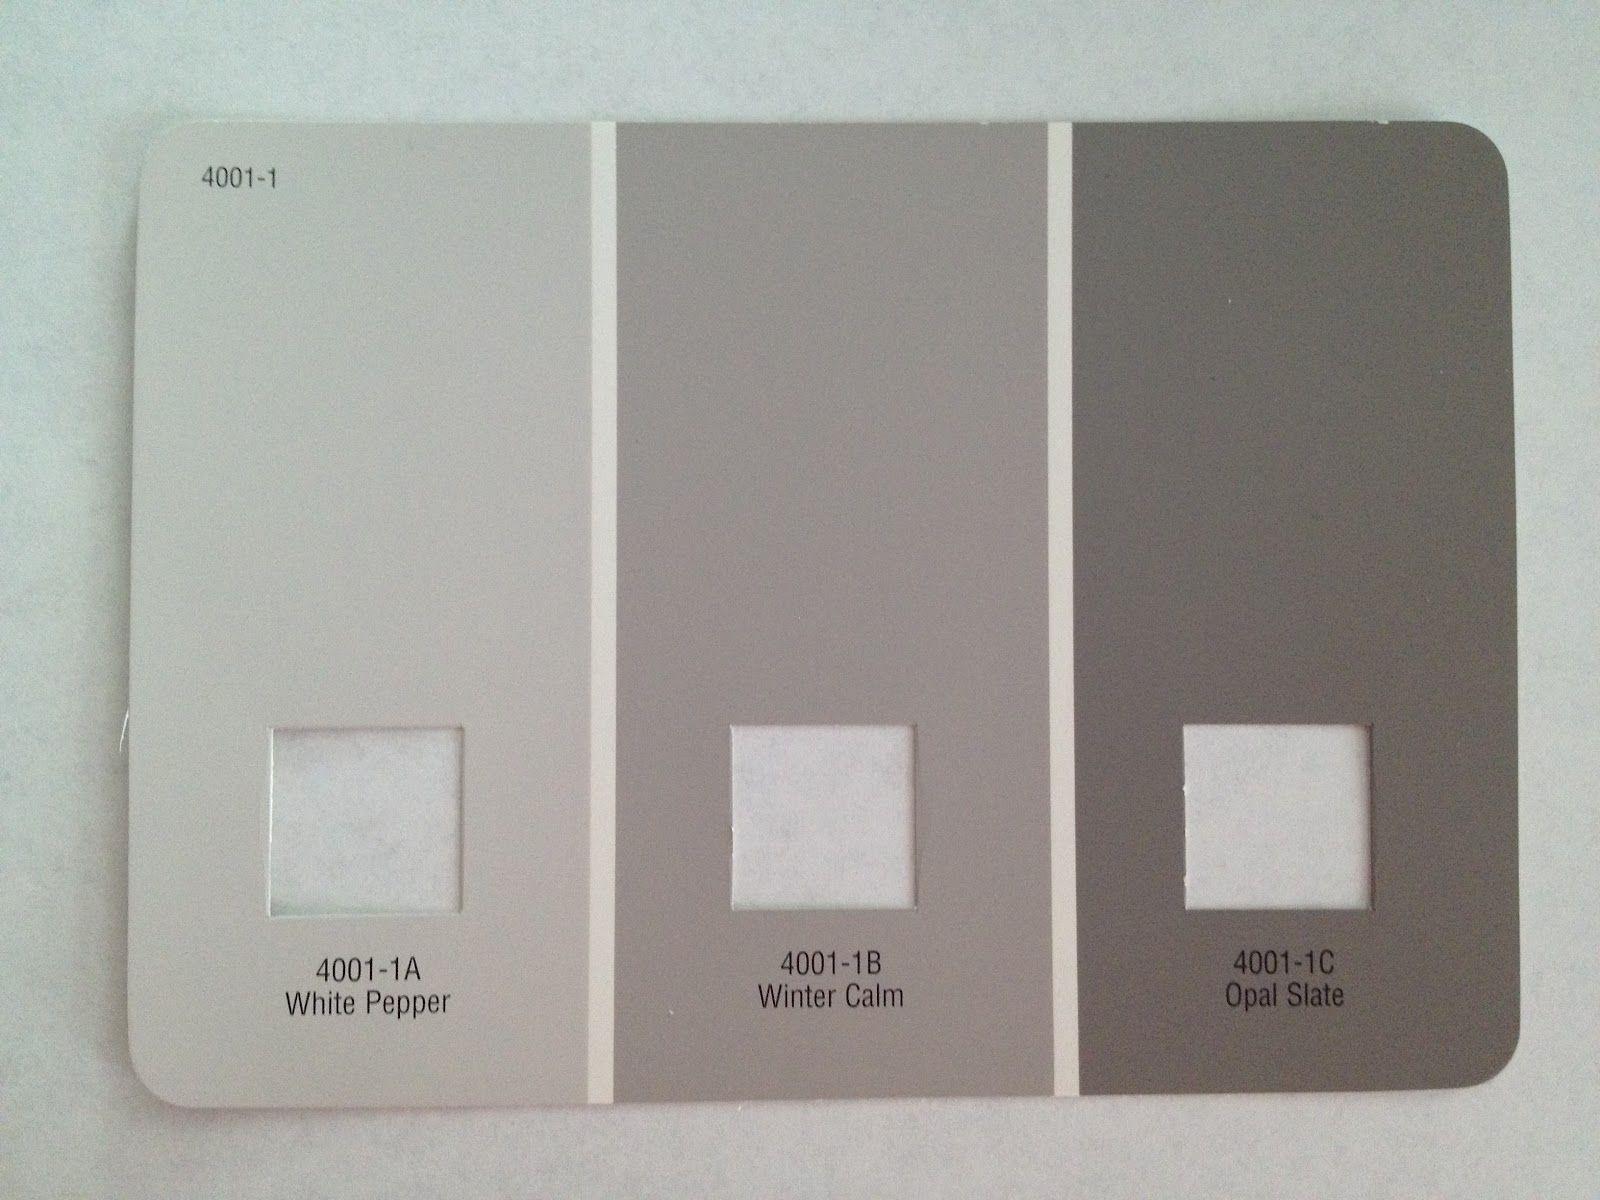 Valspar Paint Summer Grey Walls Valspar Paint Colors Gray Farmhouse Paint Colors Valspar Paint